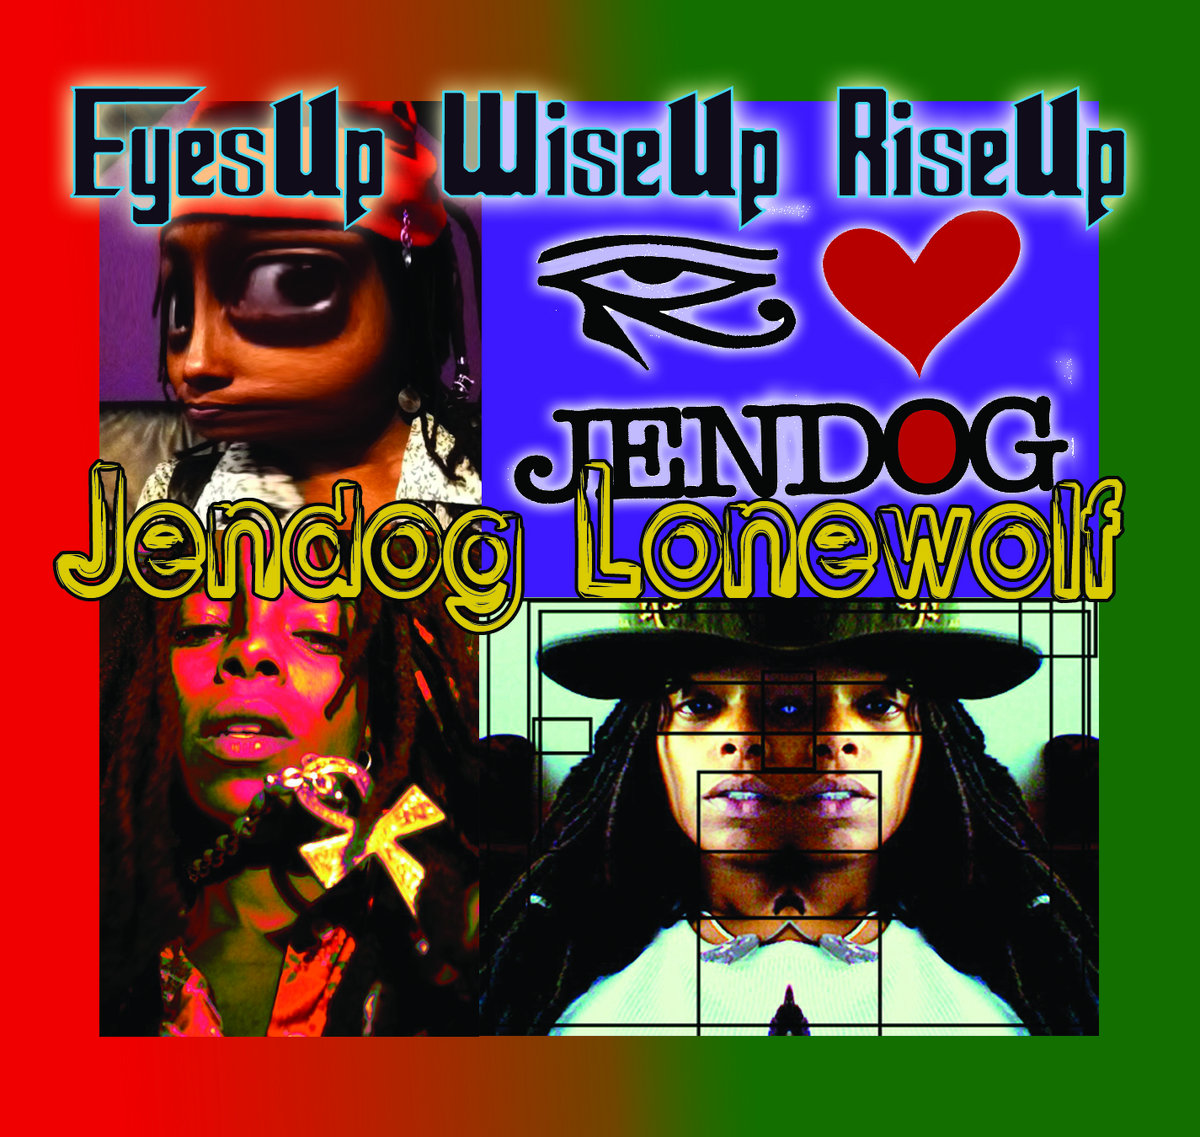 Buy My Songs – Jendog Lonewolf